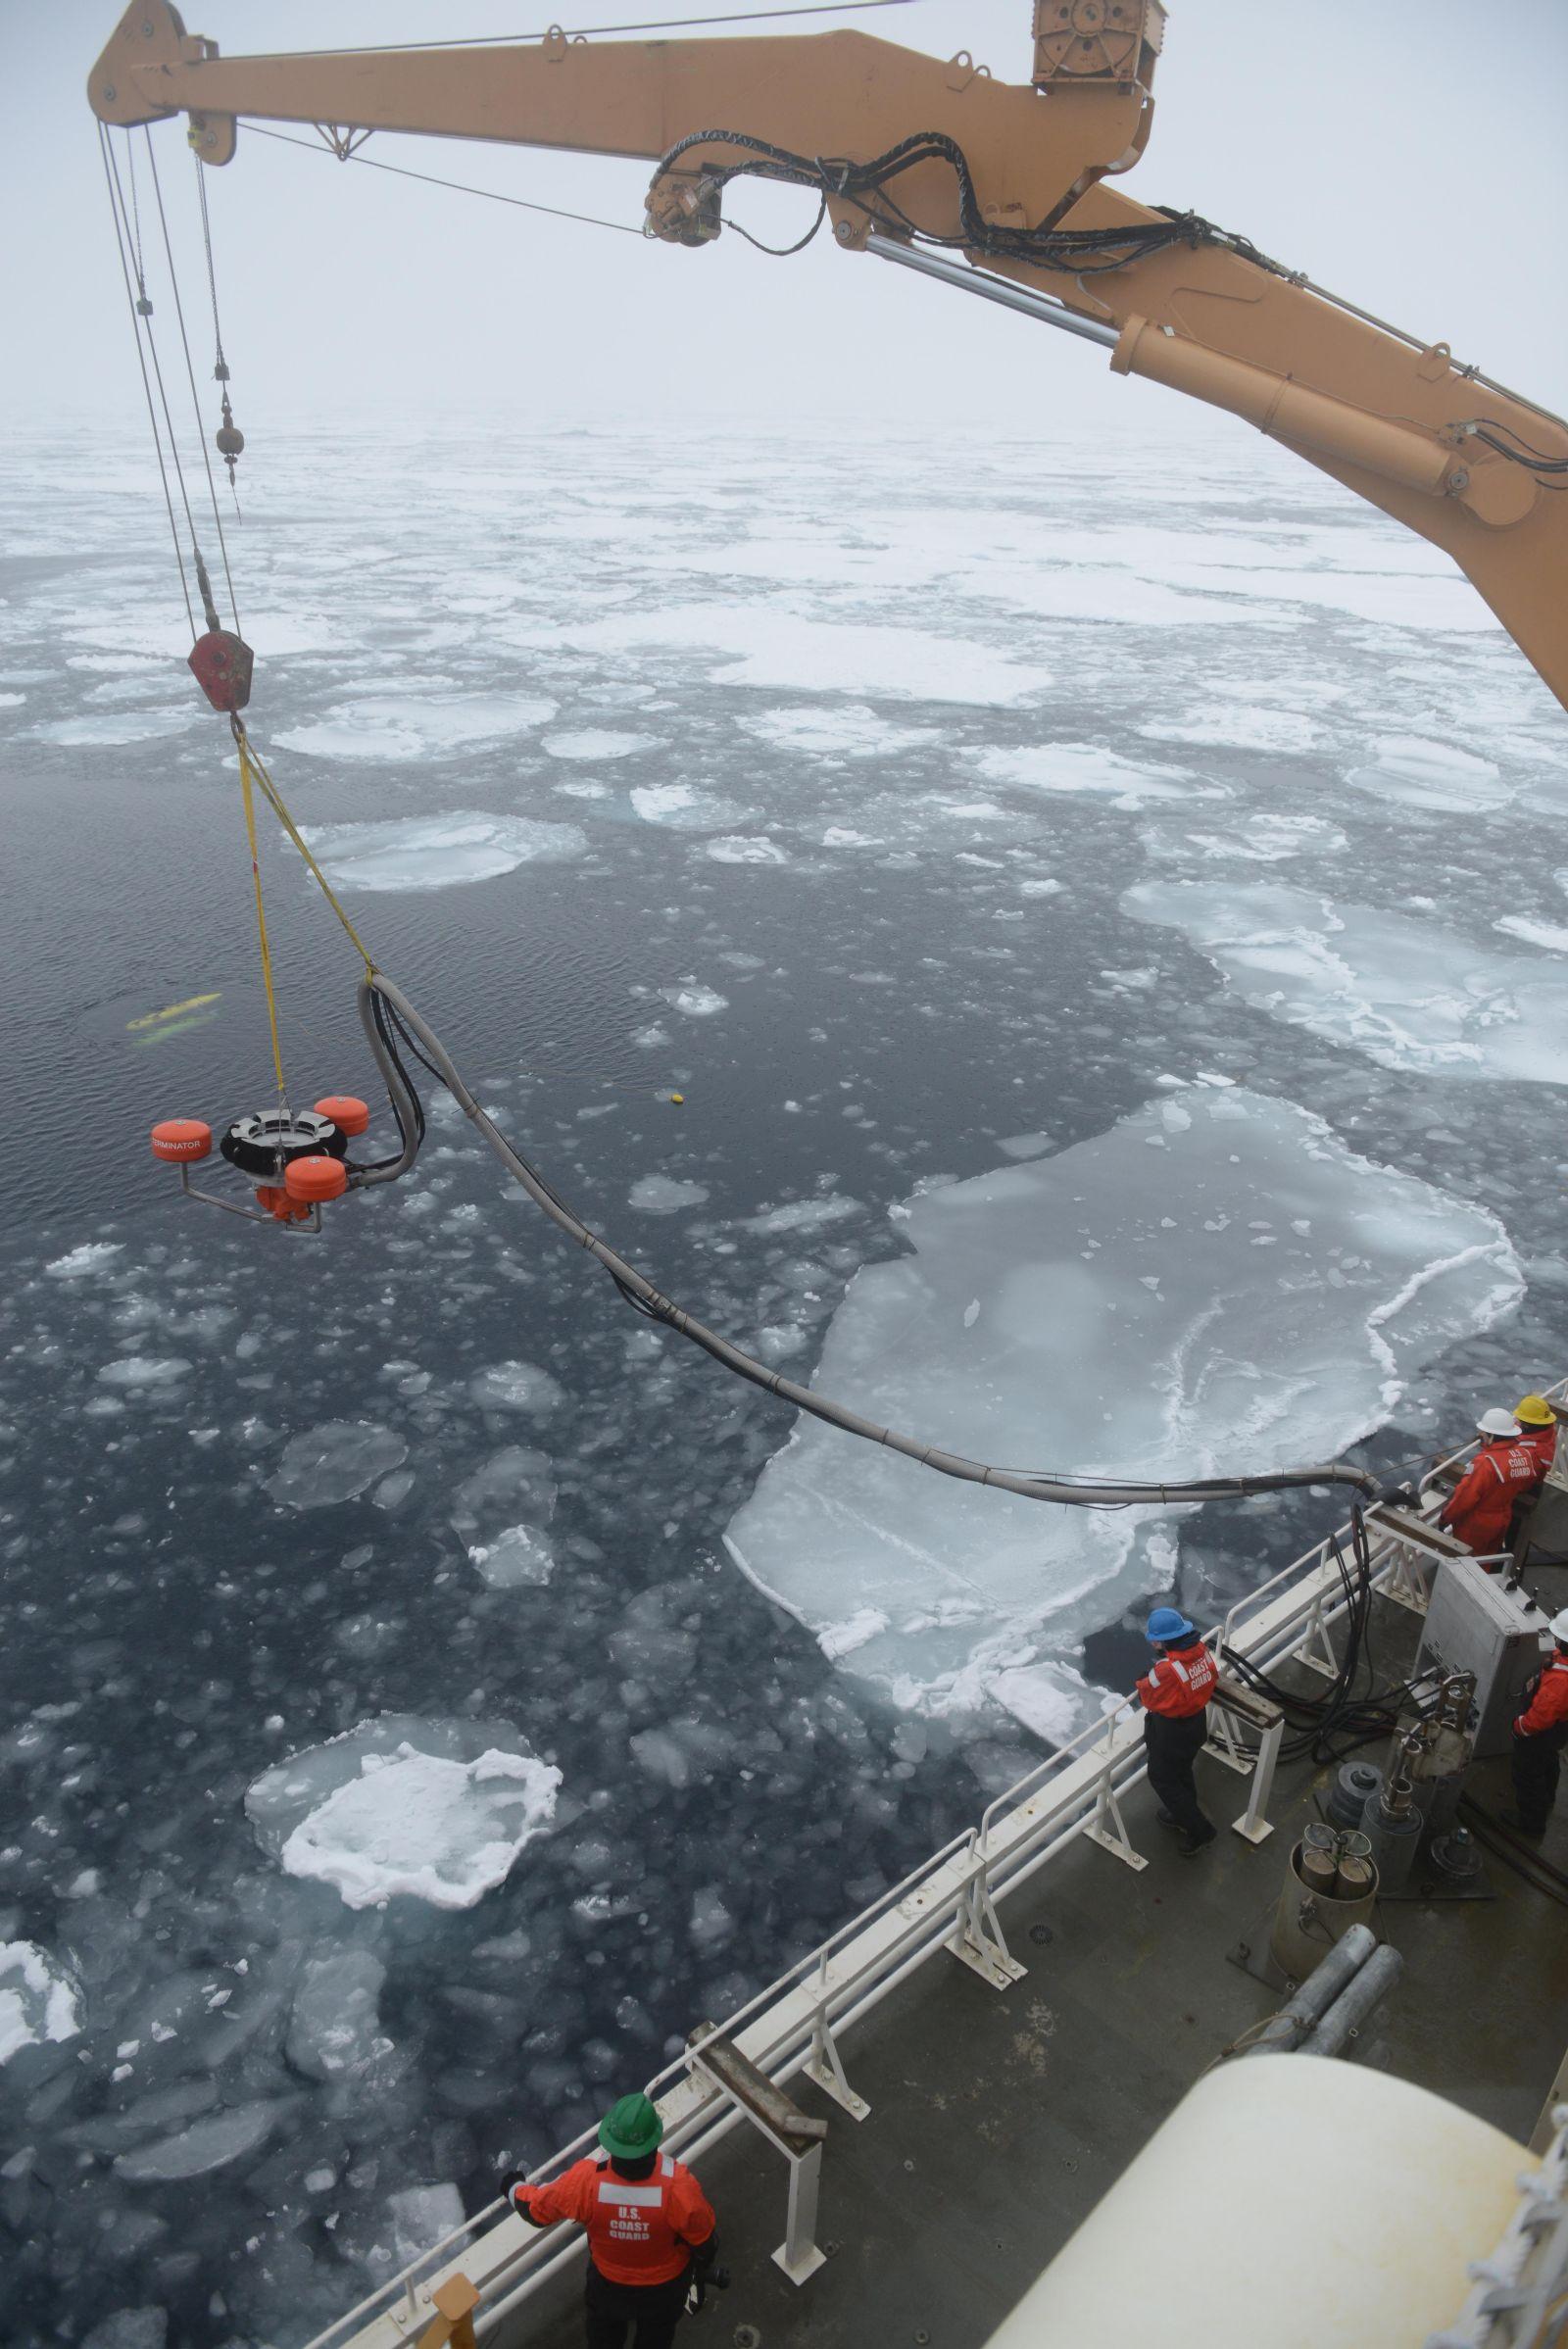 Oil spill drill in arctic